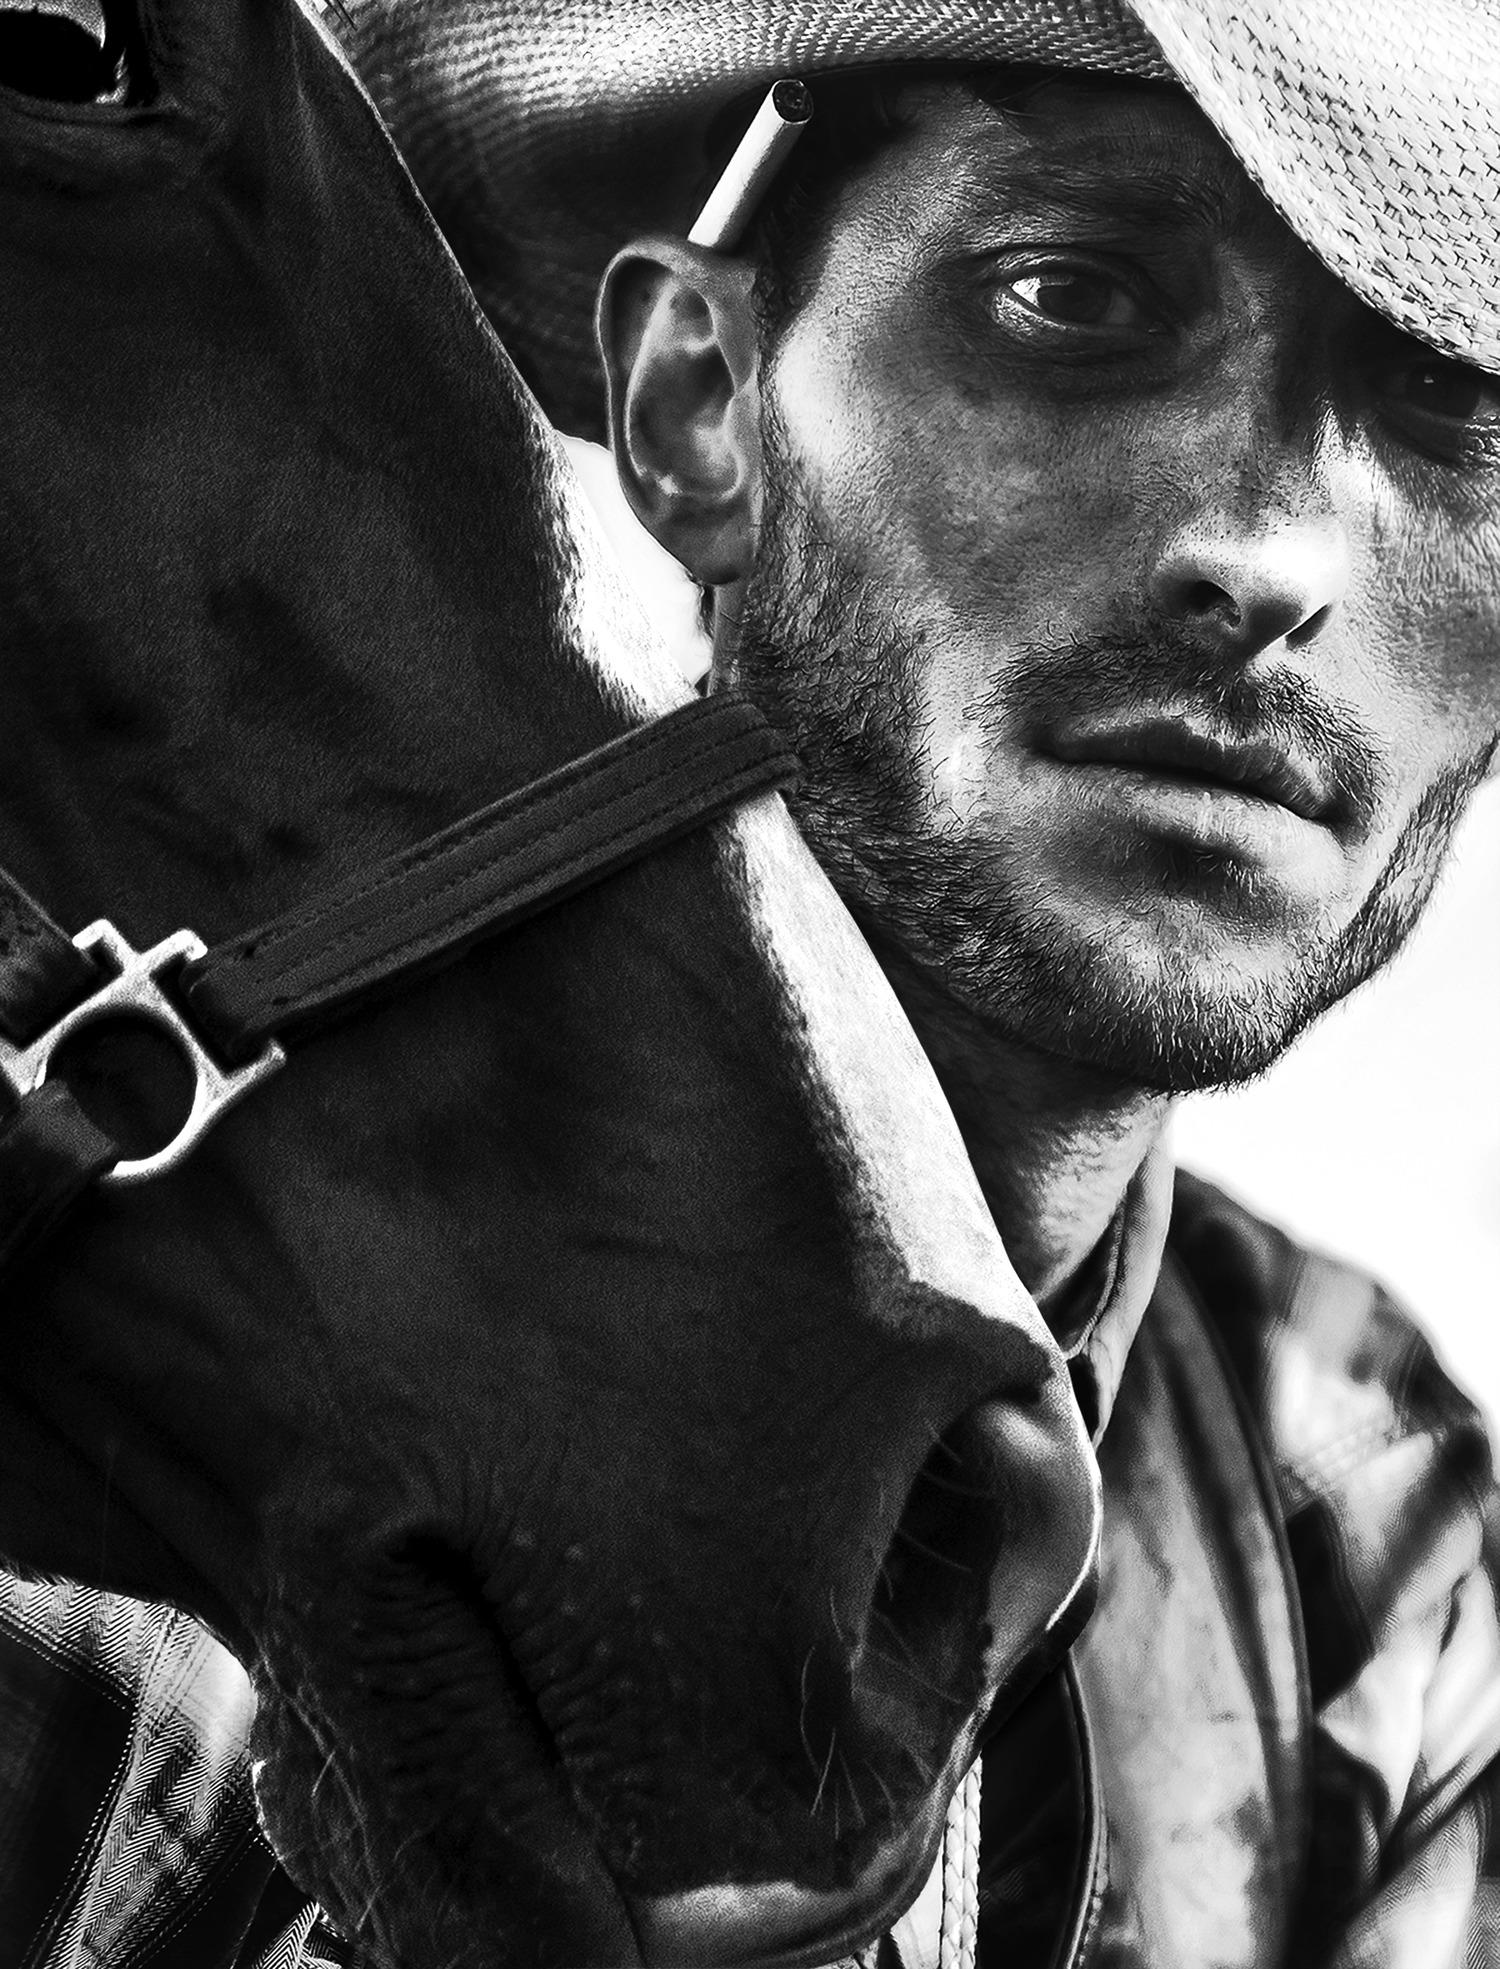 Adon Exclusive: Model Trevor Cross By Justin Llewellyn